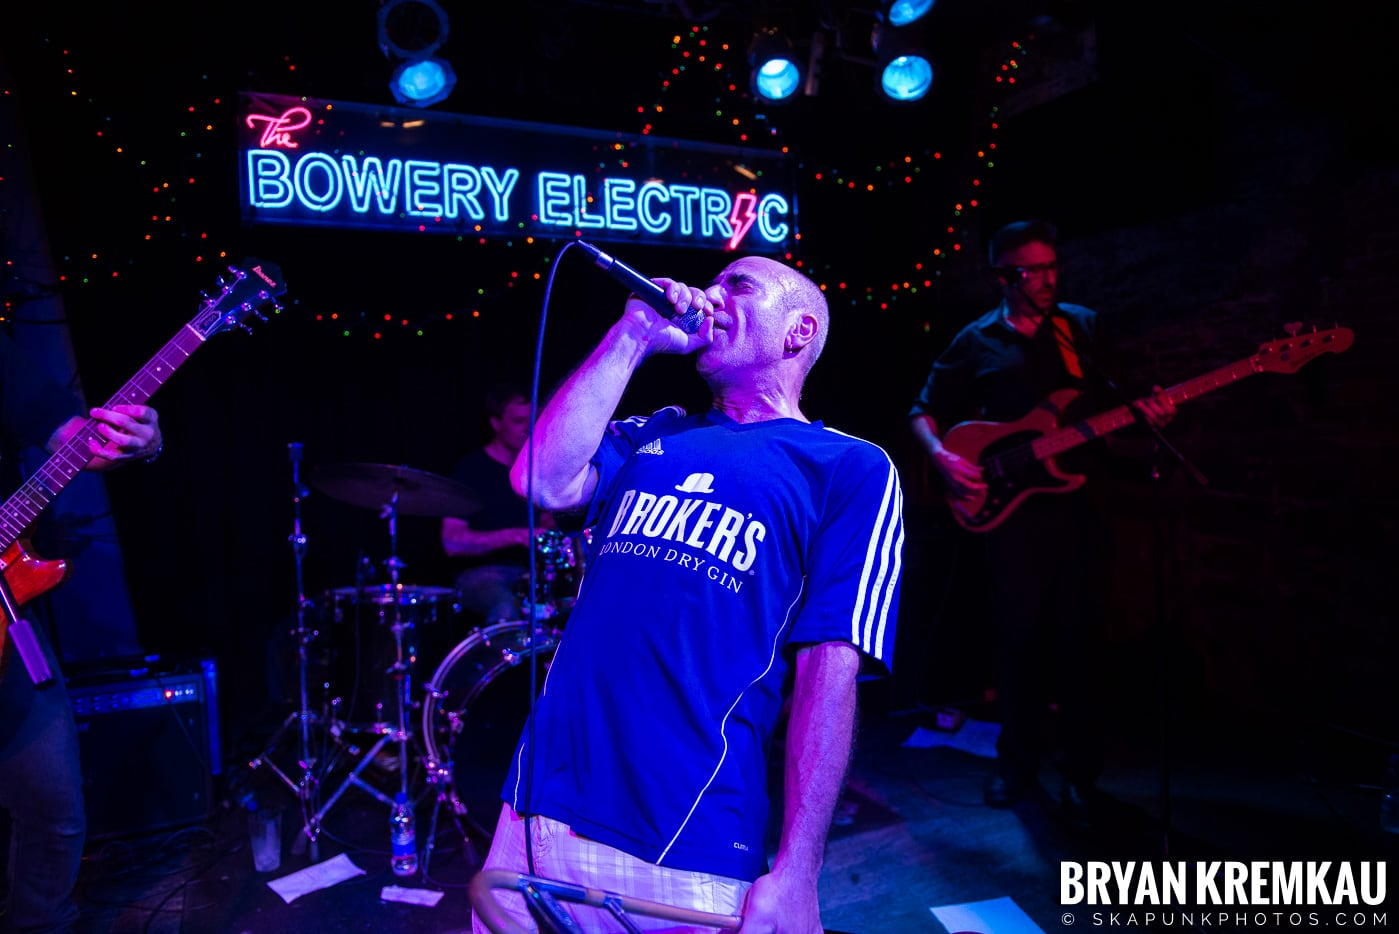 Cenzo @ Bowery Electric, NYC - 11.17.18 (8)